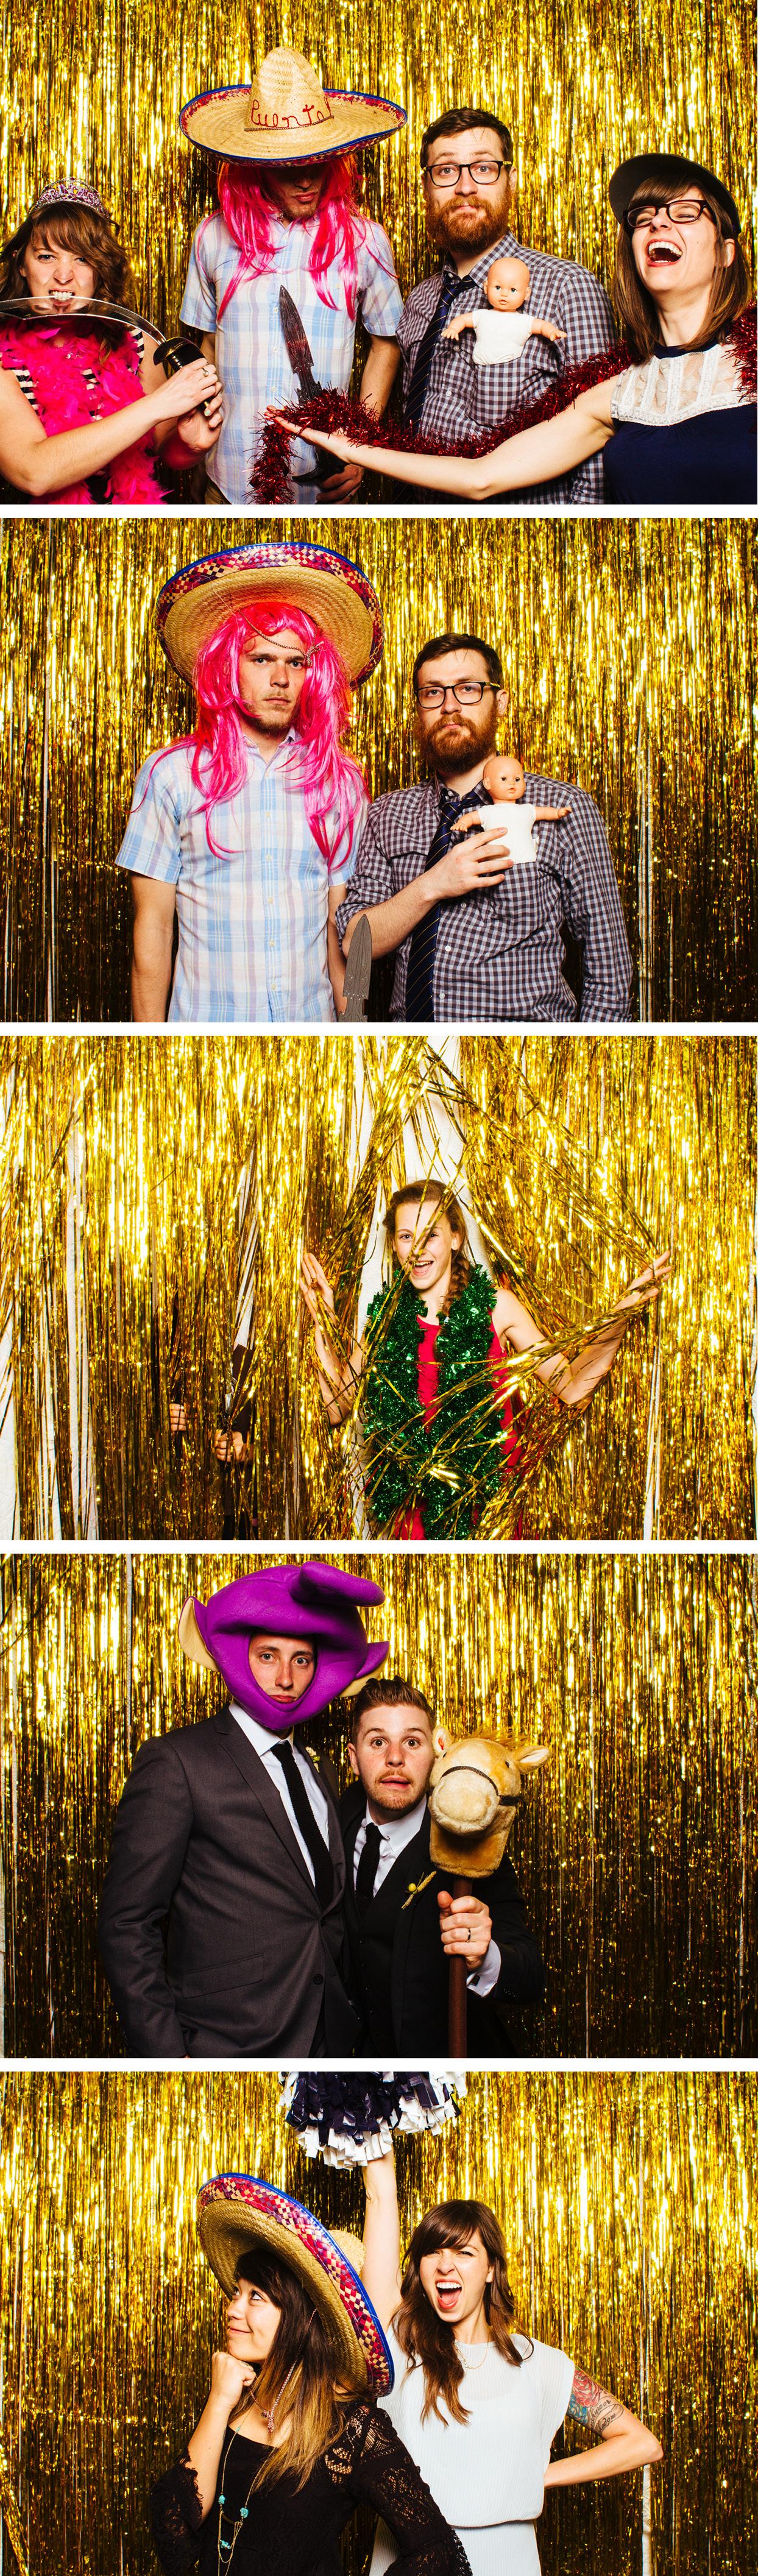 CK-Photo-Nashville-Wedding-Photographer-Photobooth-DL9.jpg